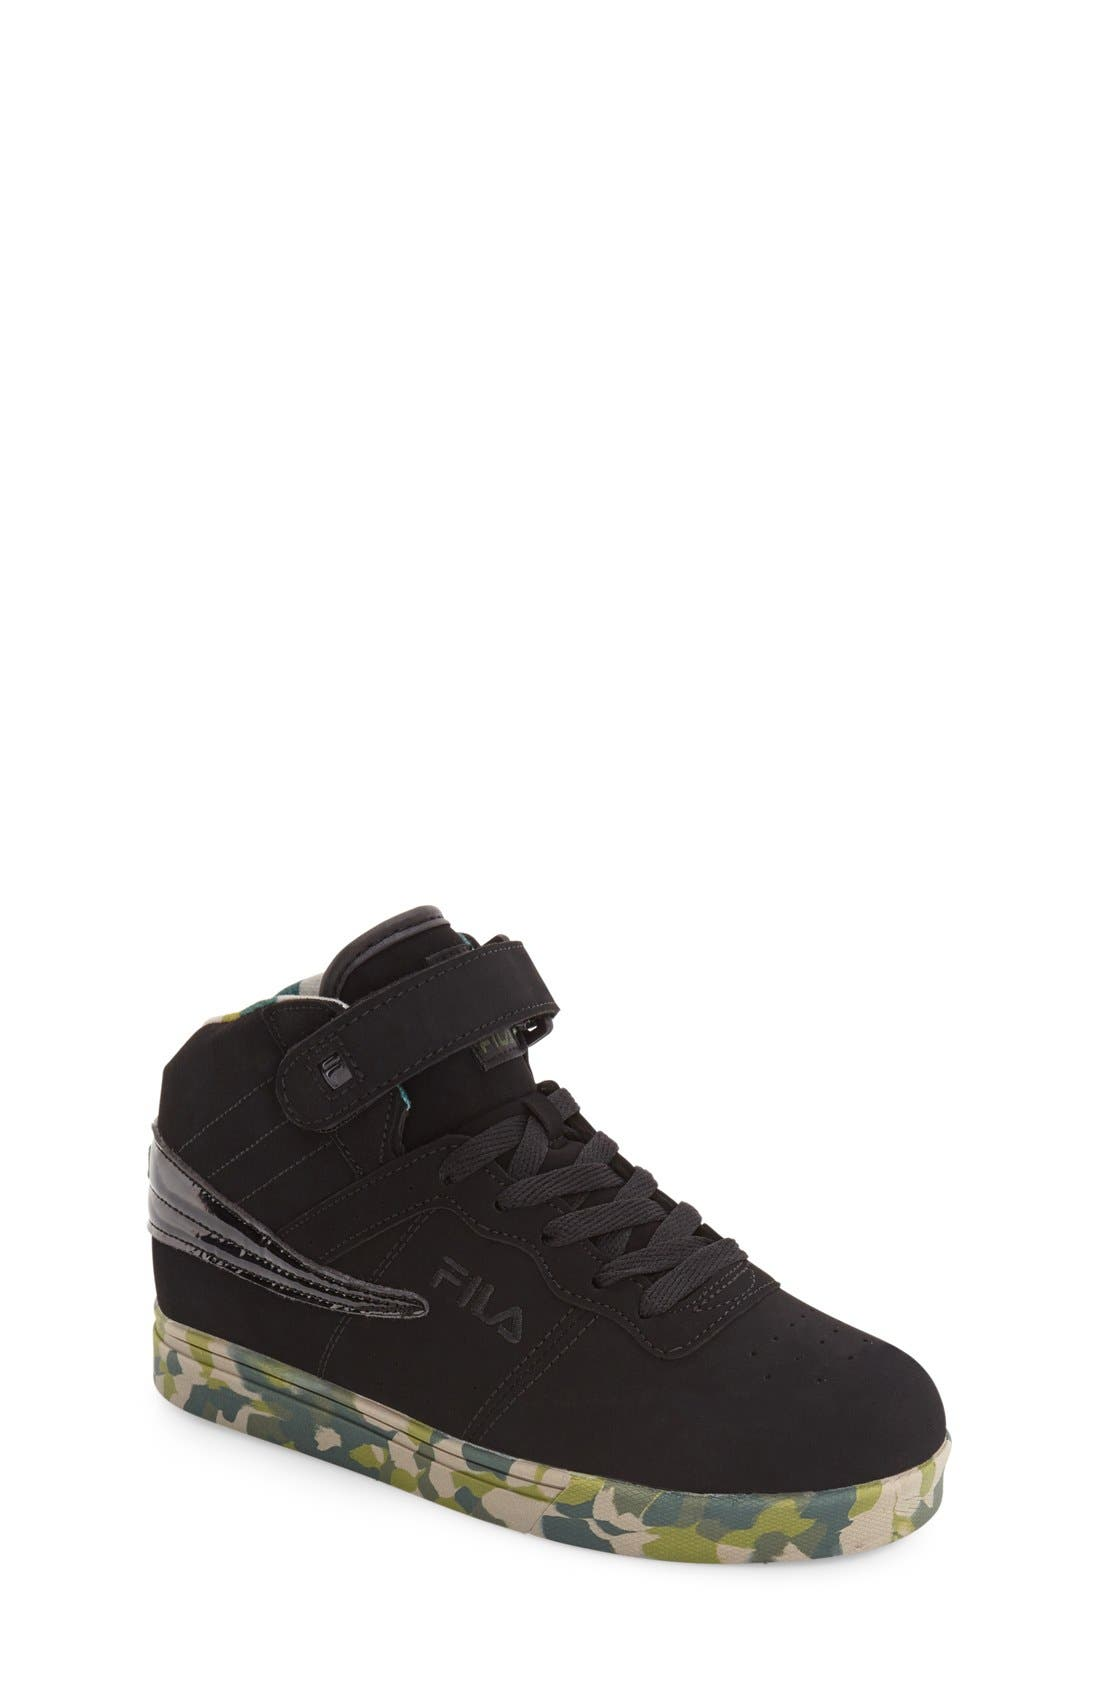 Vulc 13 Mashup High Top Sneaker,                         Main,                         color, 001